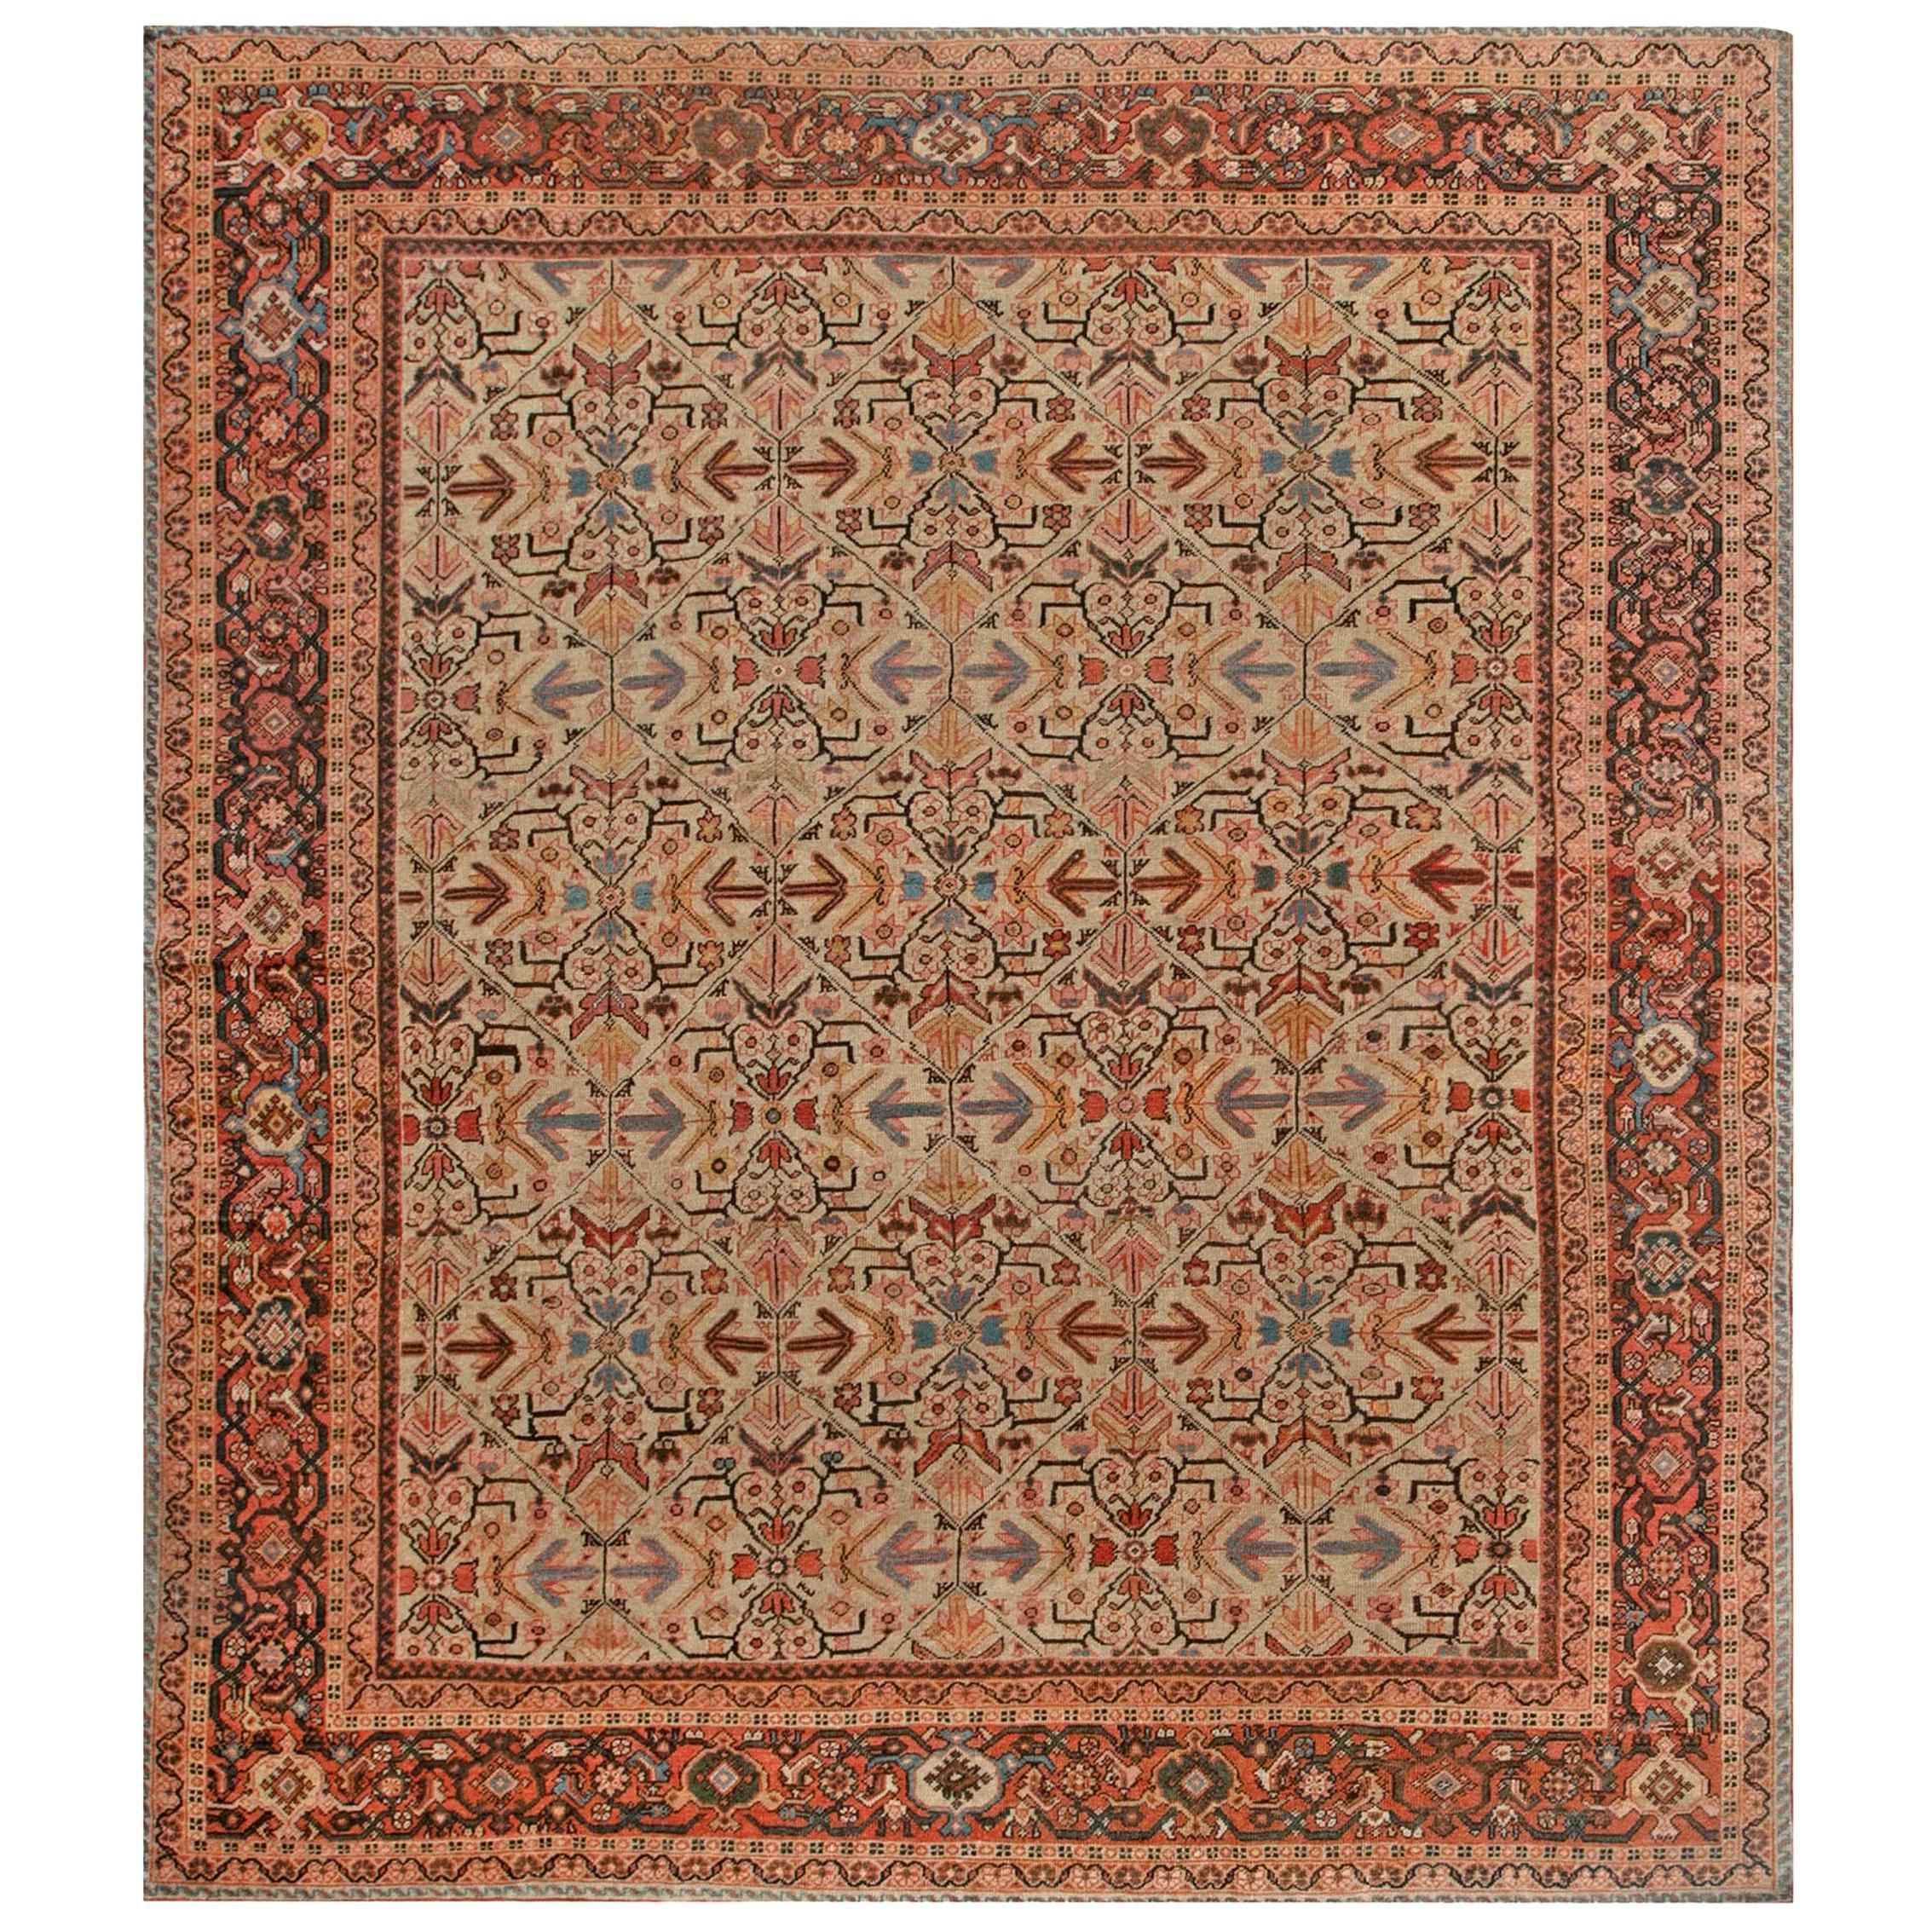 Antique Persian Sultanabad Beige, Blue, Brown and Orange Handmade Wool Rug